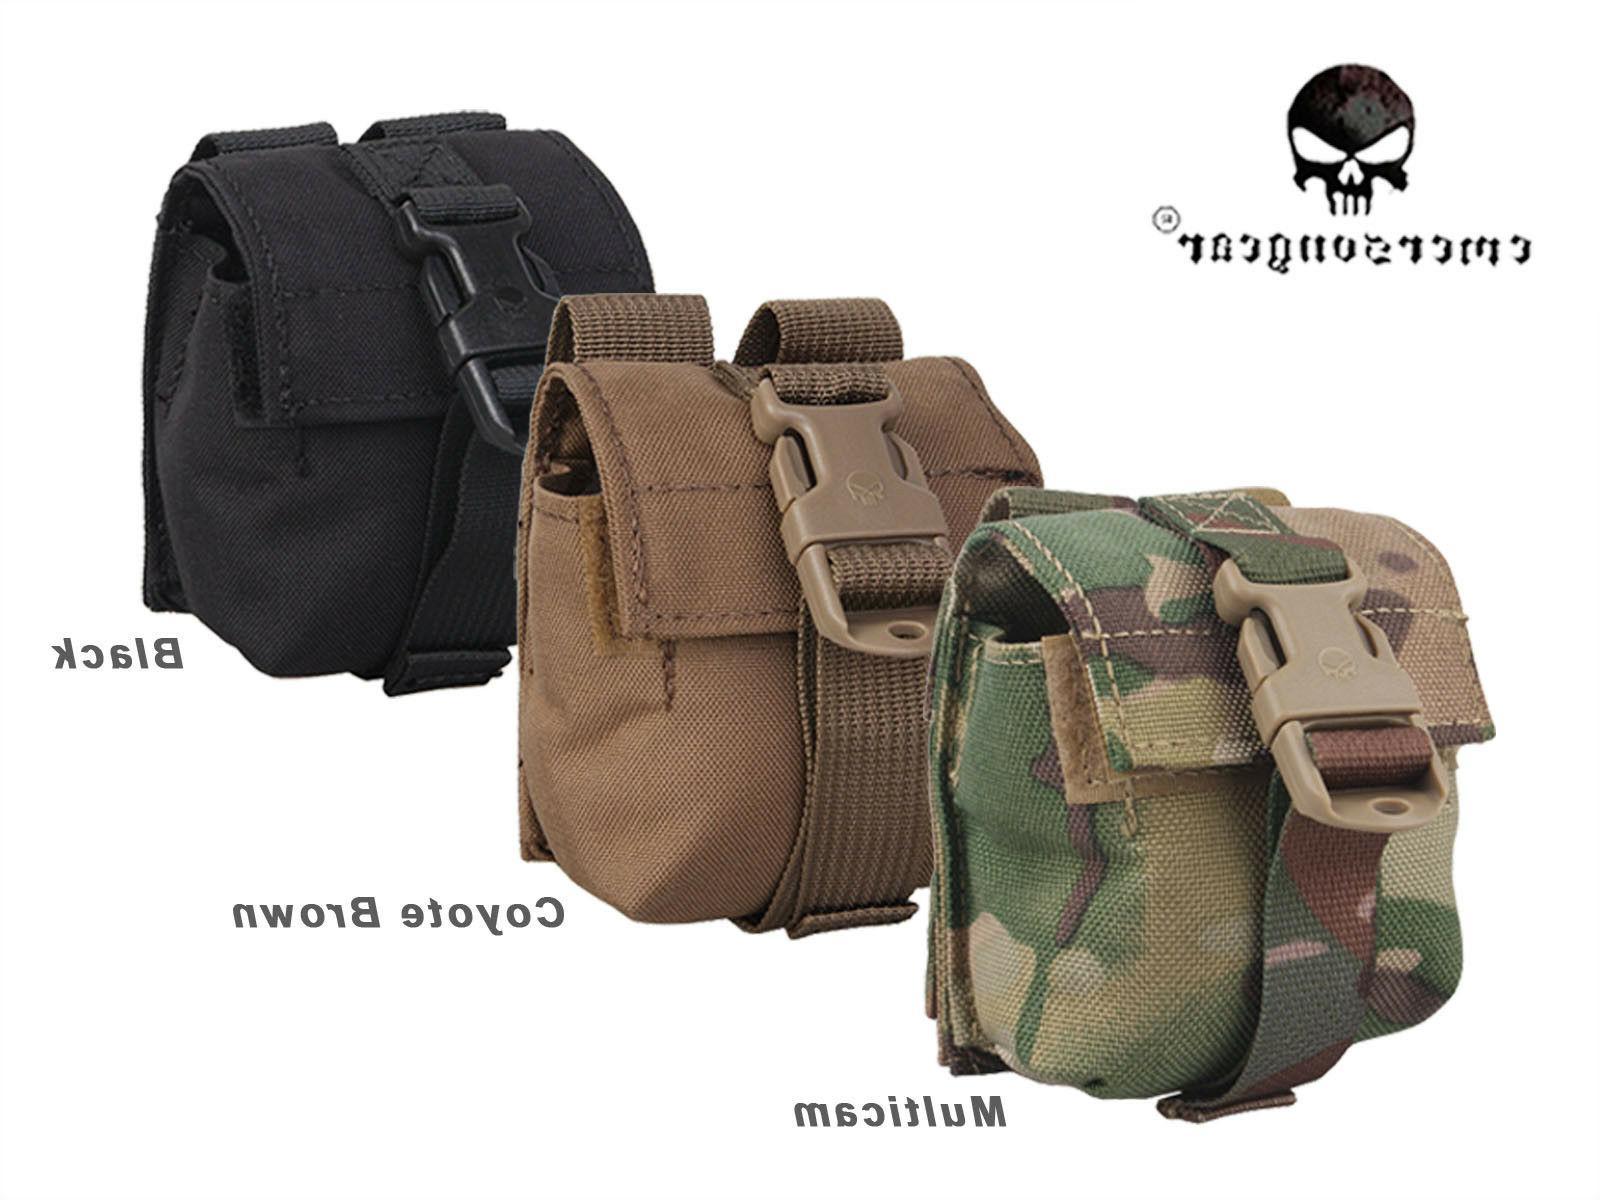 lbt style single tactical hunting bag gear